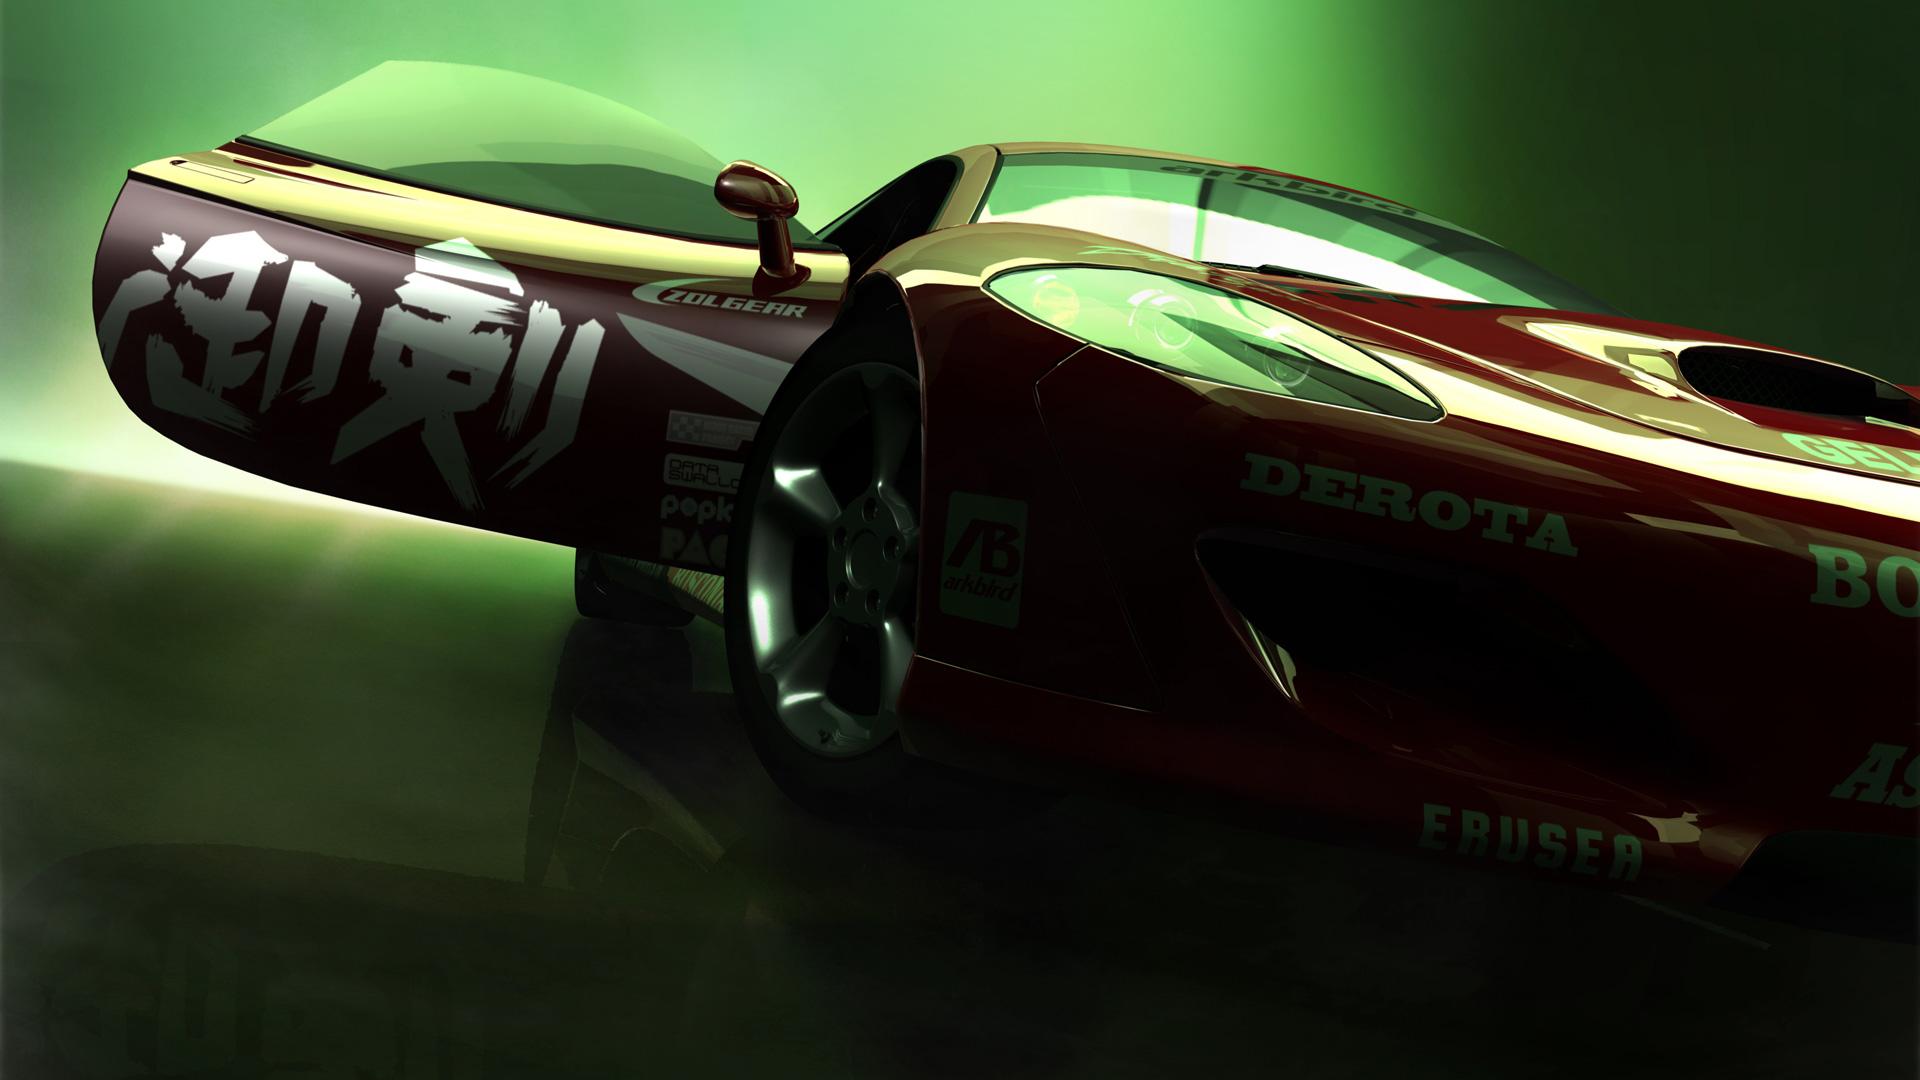 Top Desktop HD Wallpapers: Ridge Racer 1080p HD Car